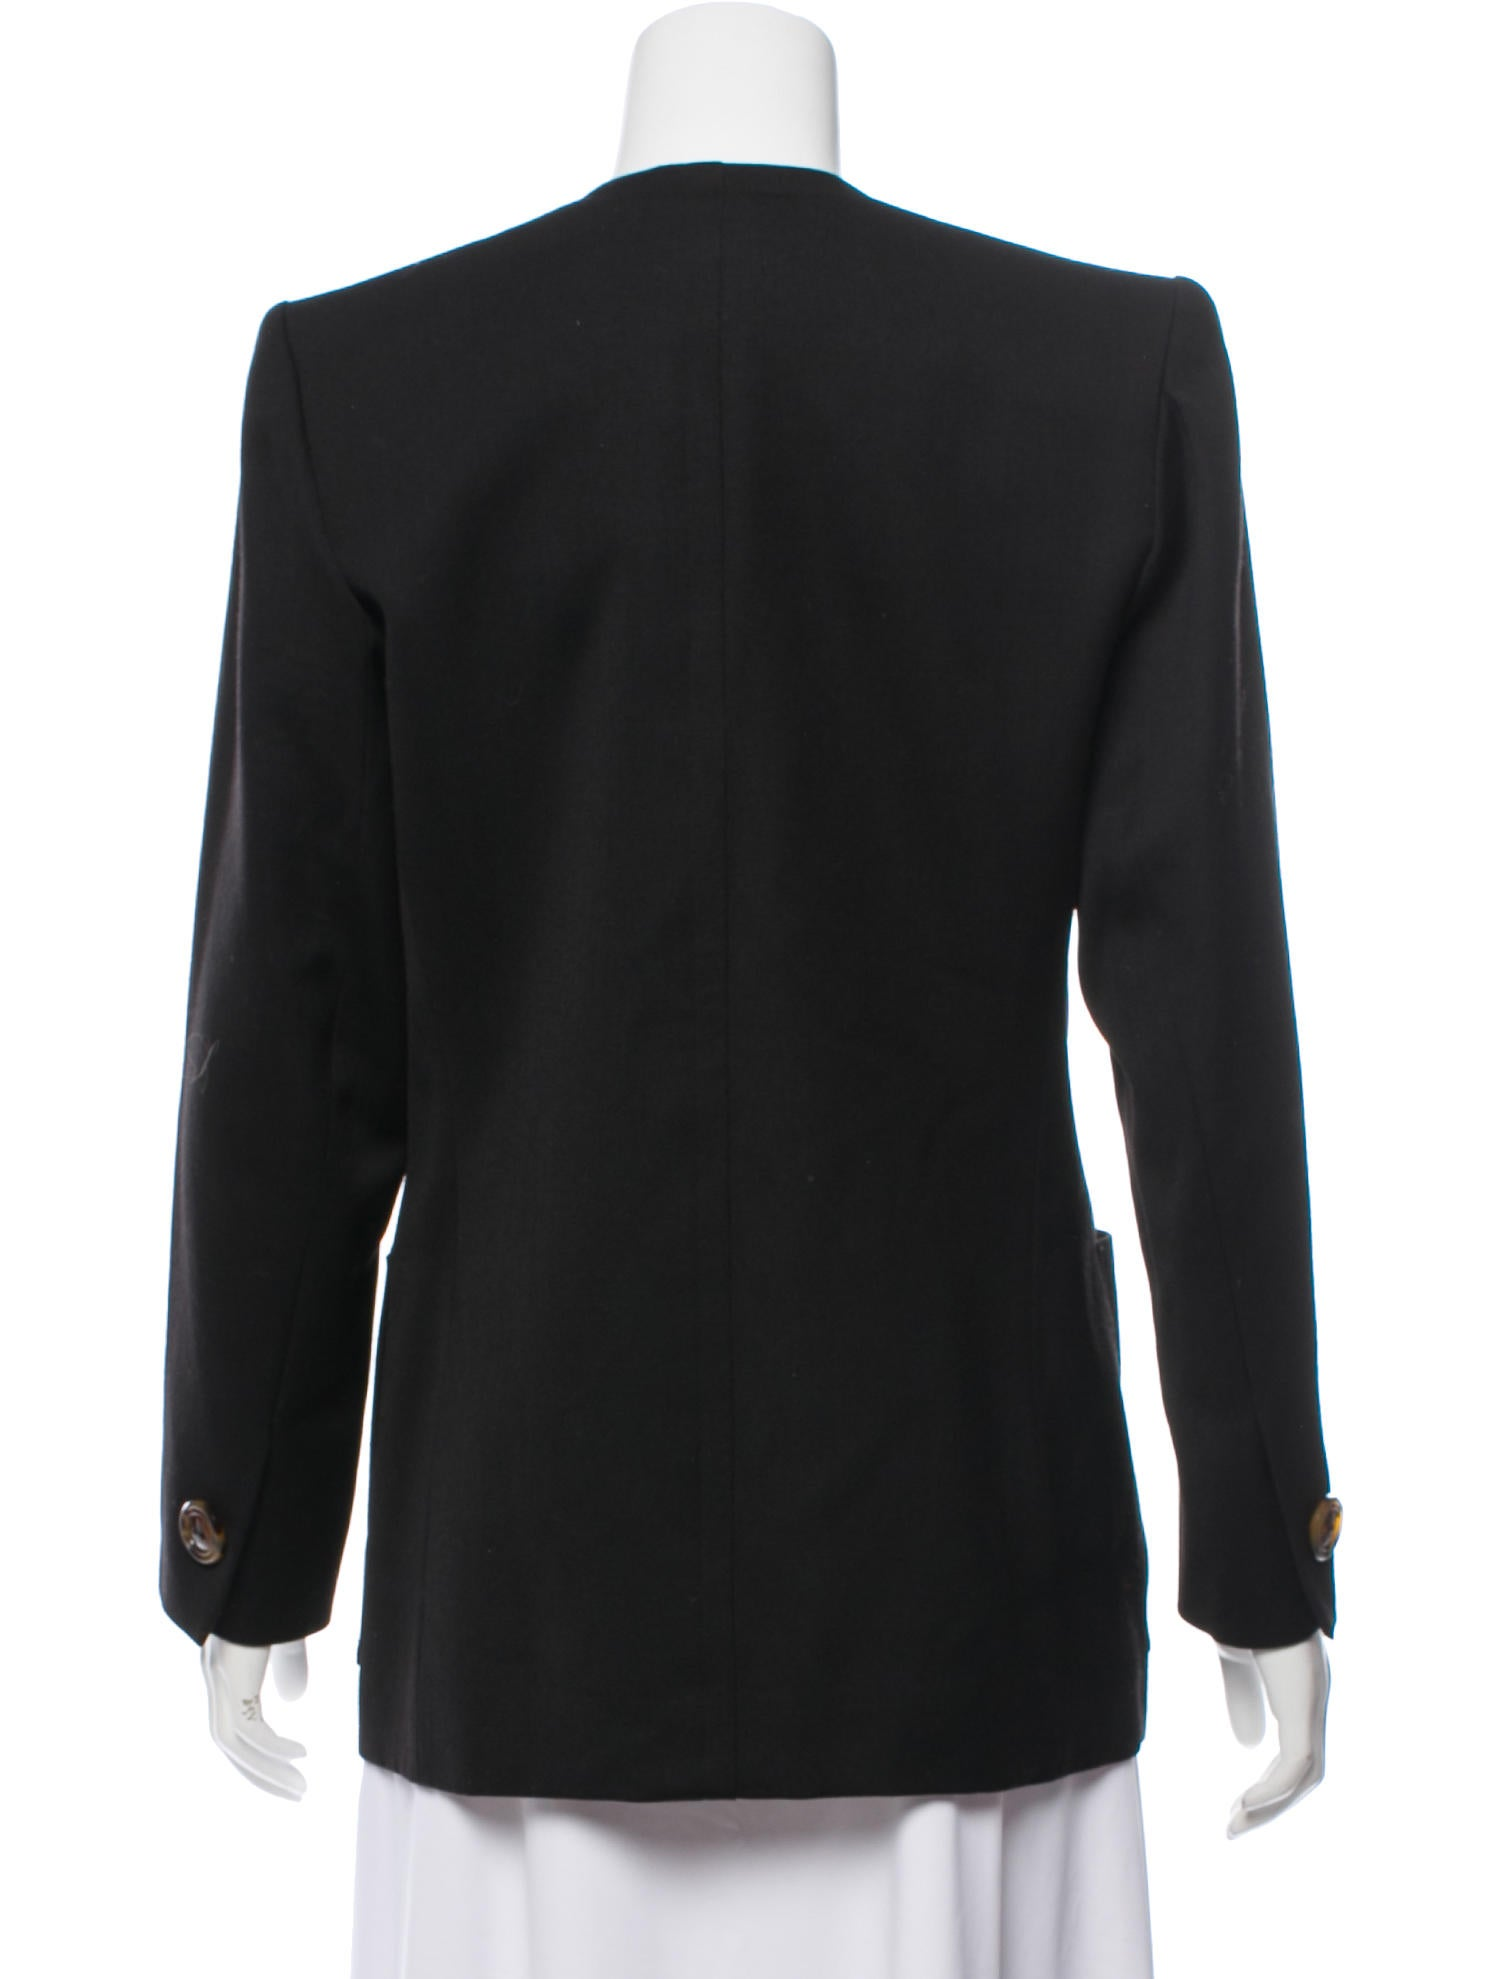 887fa136039 Yves Saint Laurent Vintage Structured Jacket - Clothing - YVE84885 ...